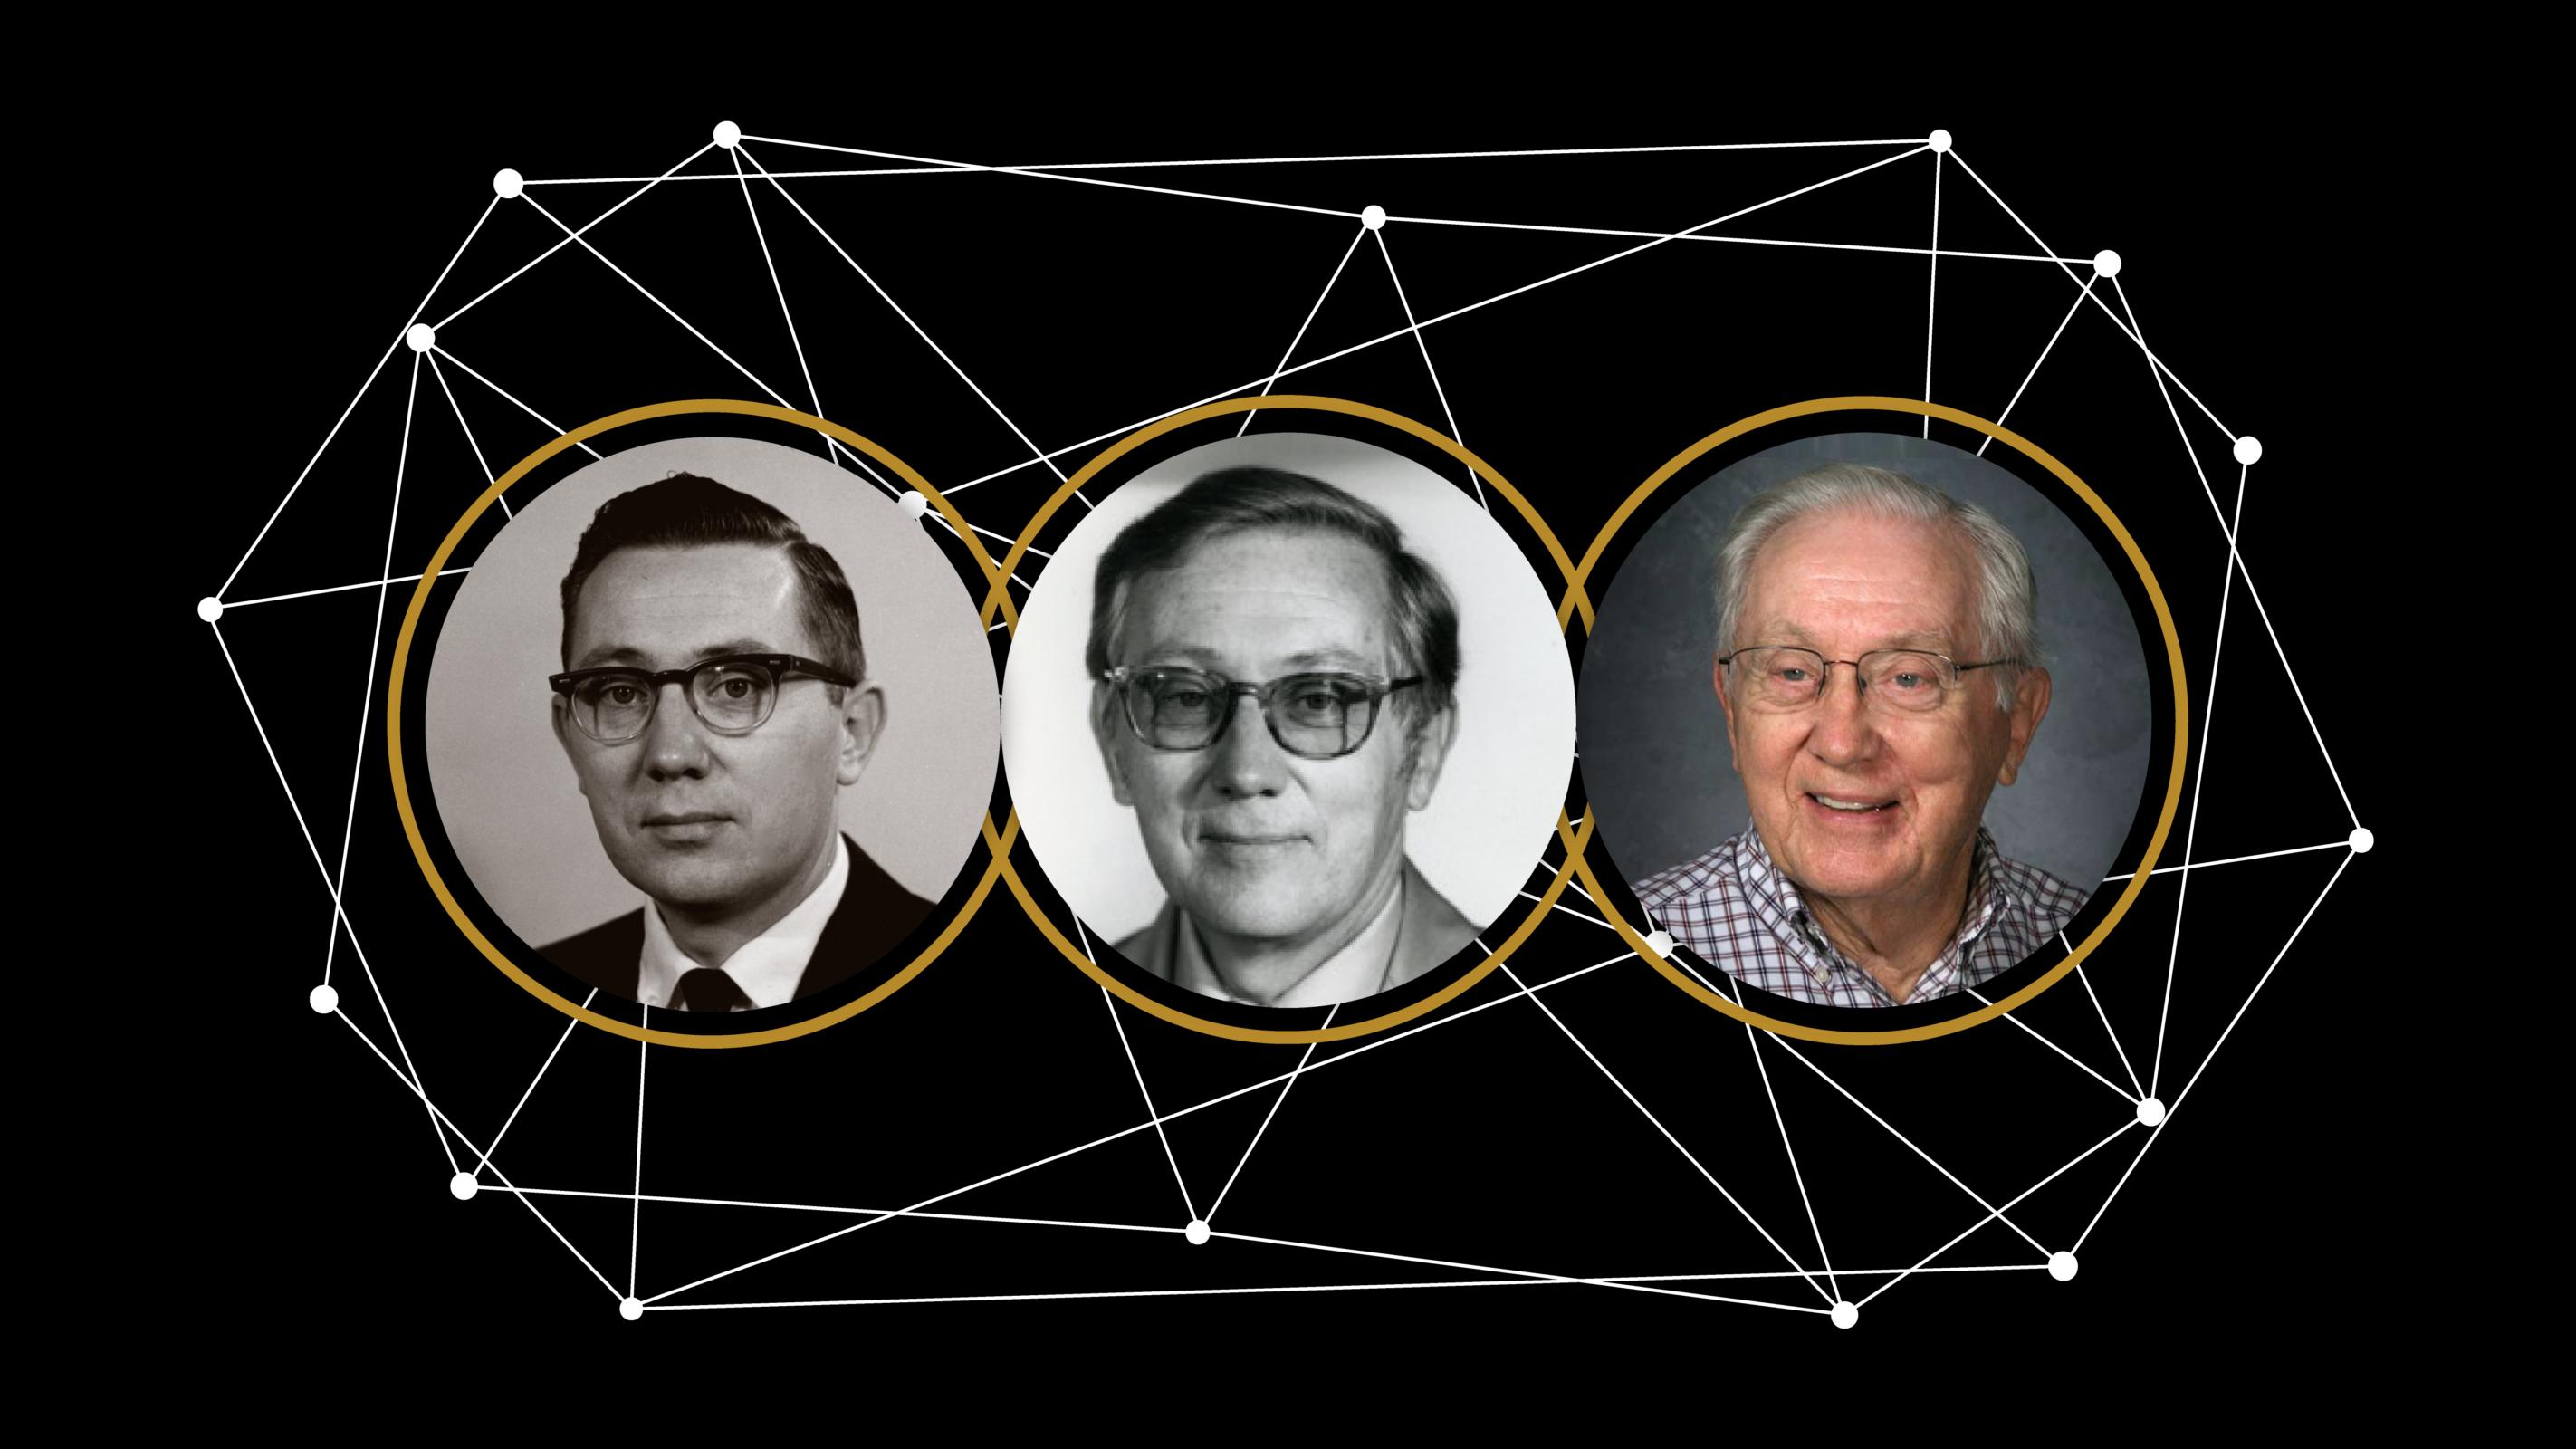 Three portrait photos of Walt Hancock through the years.